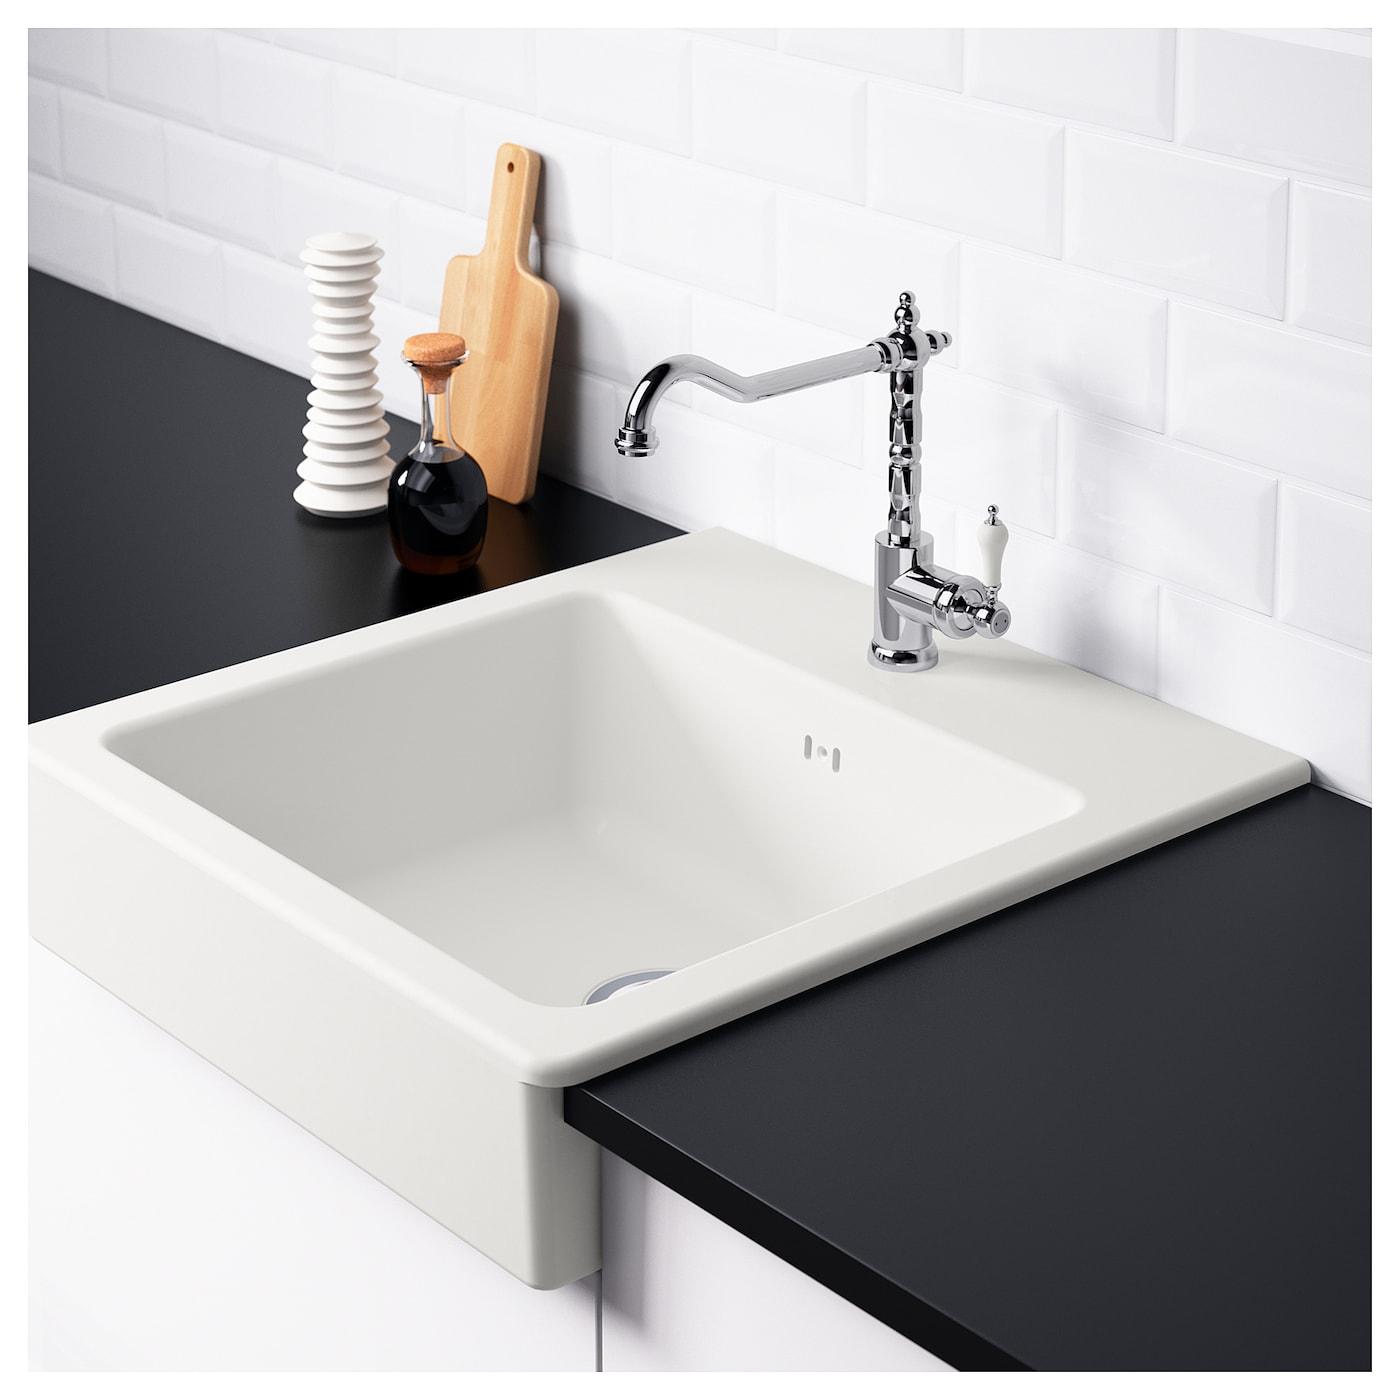 domsj vier poser 1 bac blanc 62x66 cm ikea. Black Bedroom Furniture Sets. Home Design Ideas